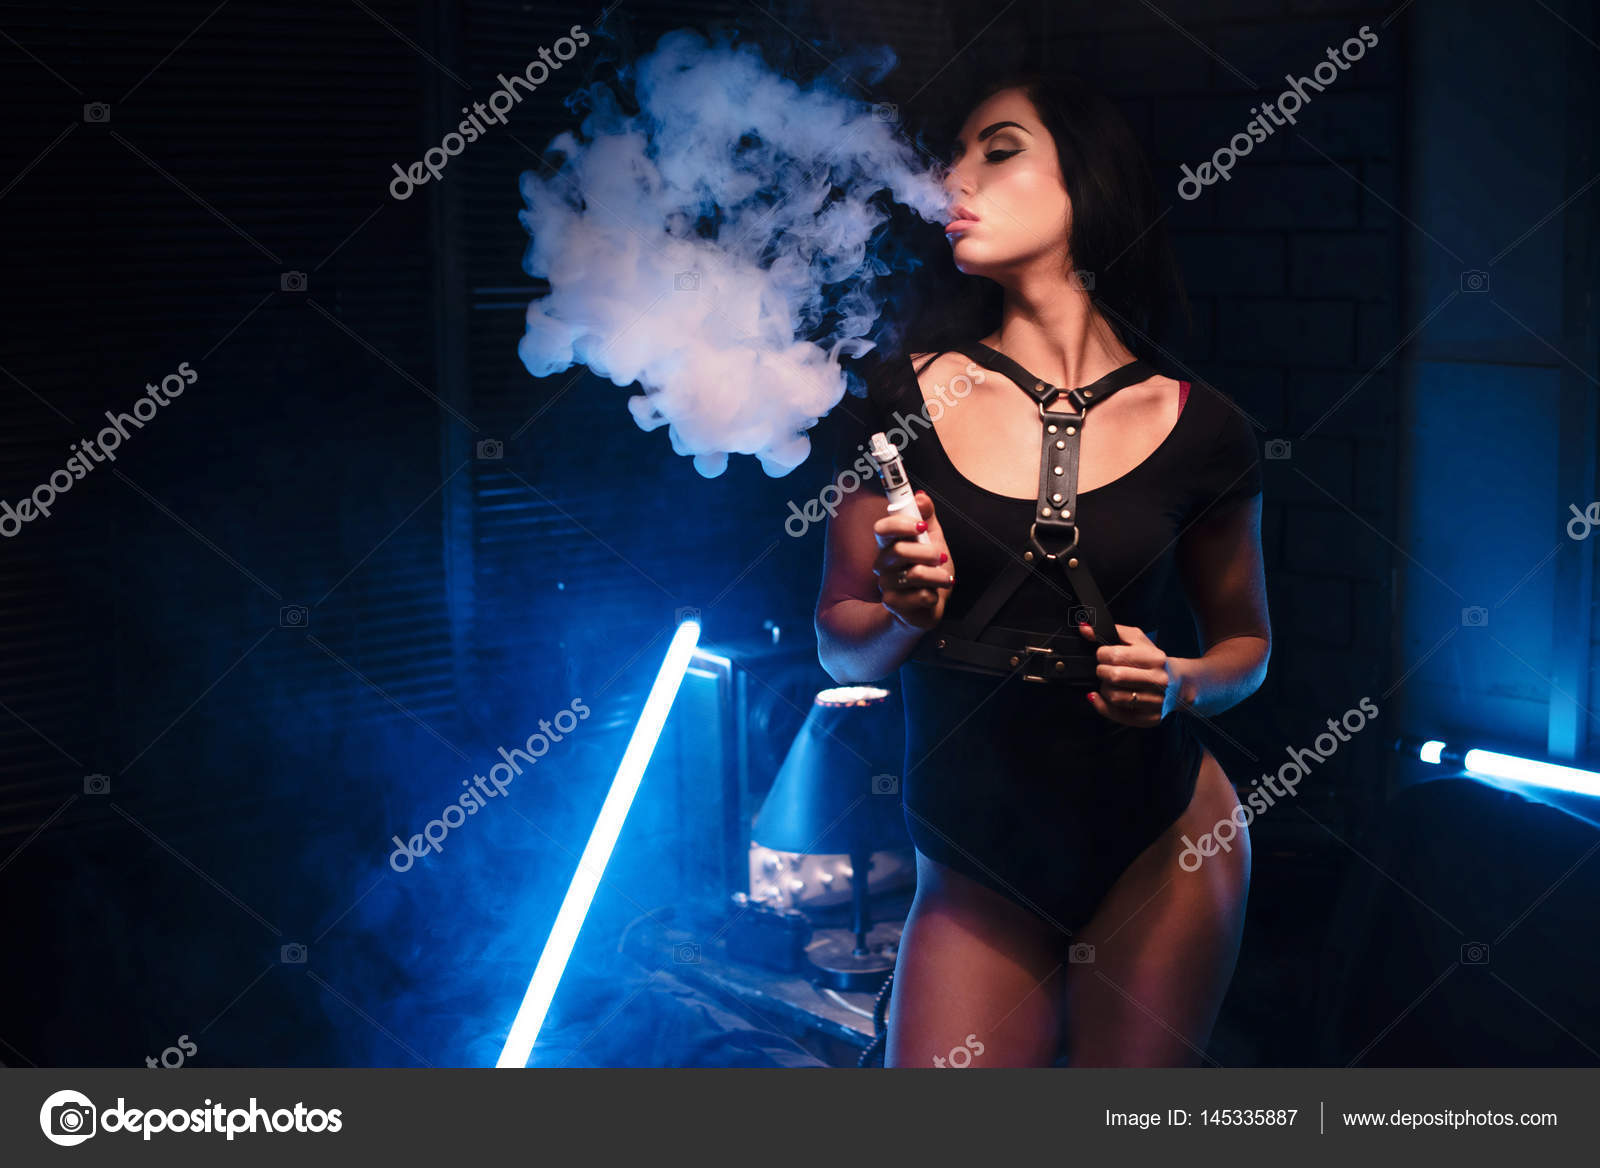 Hot Blouse boobs